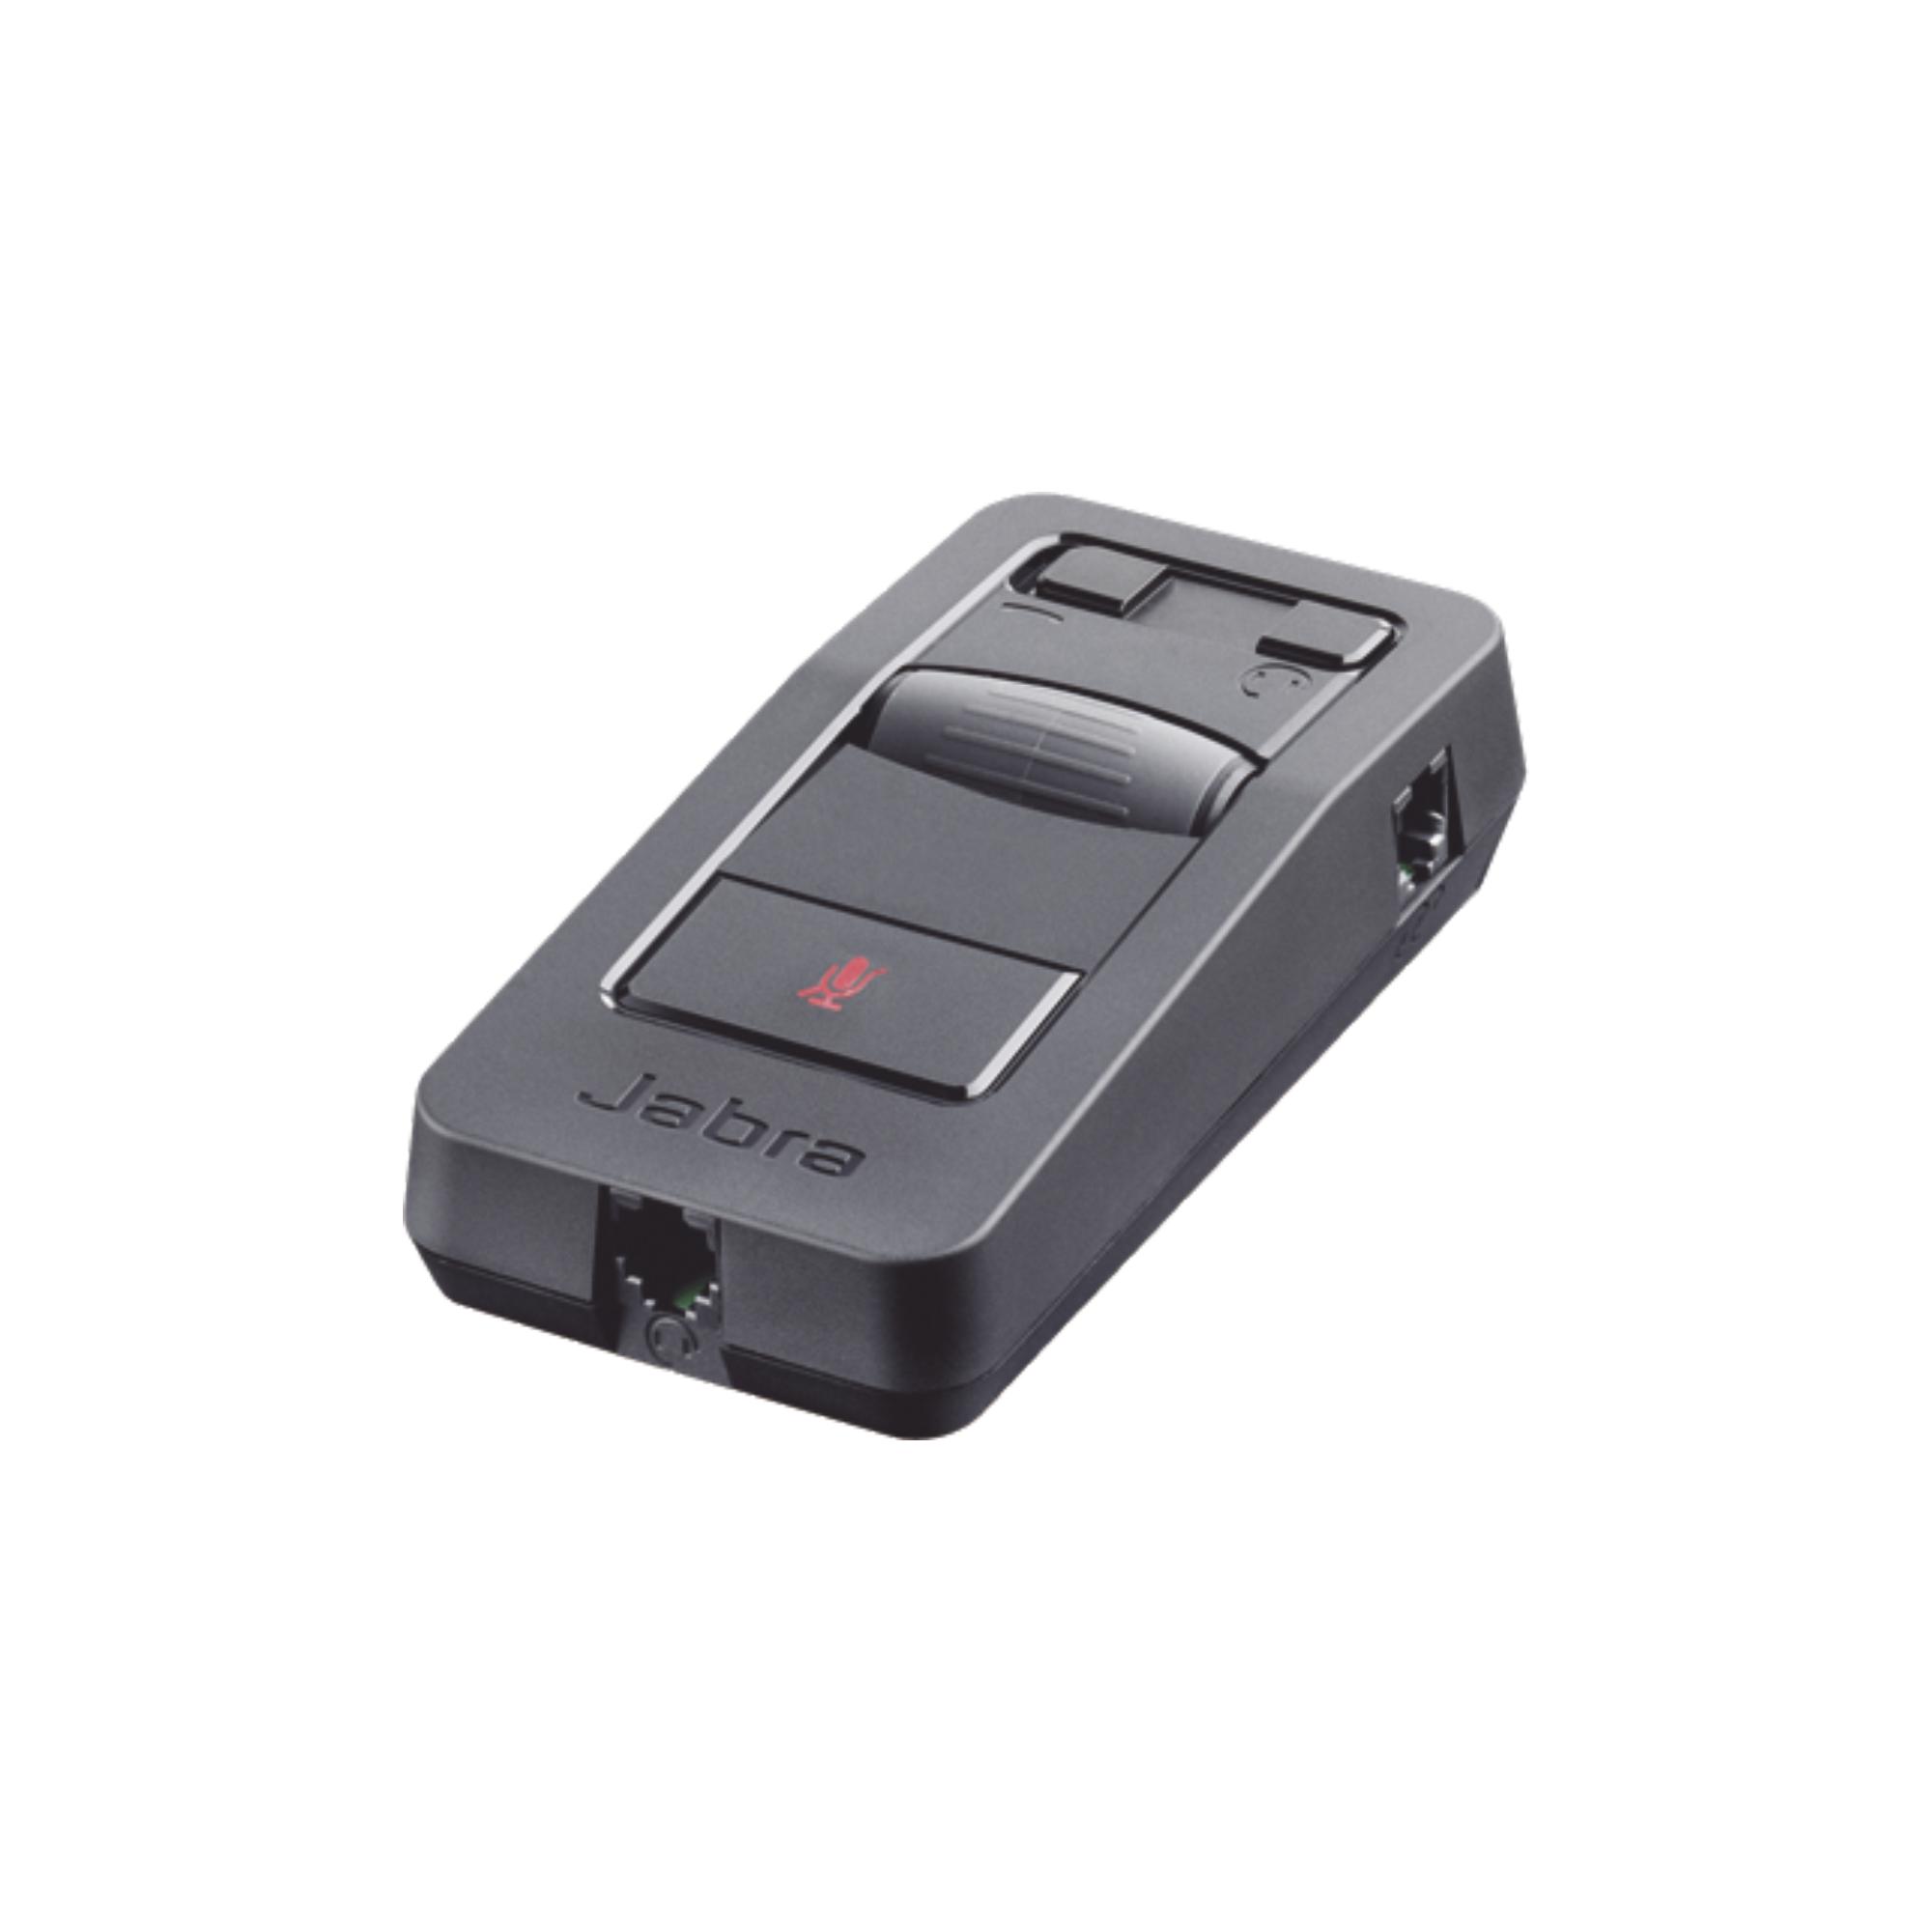 Jabra Link 850 con conexión QD (850-09)